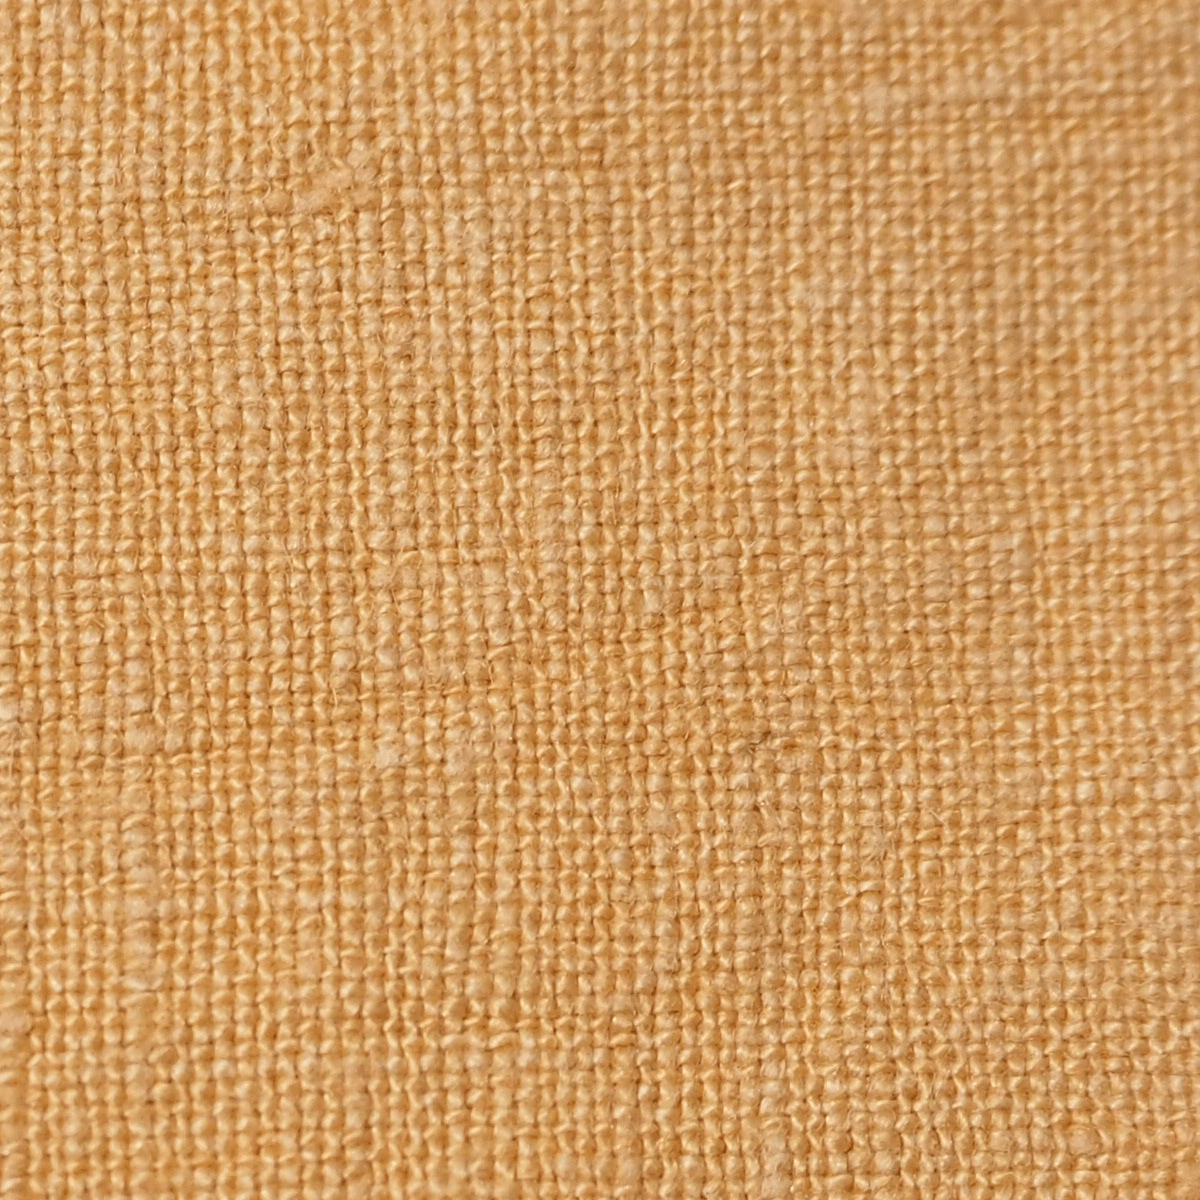 Lino color naranja